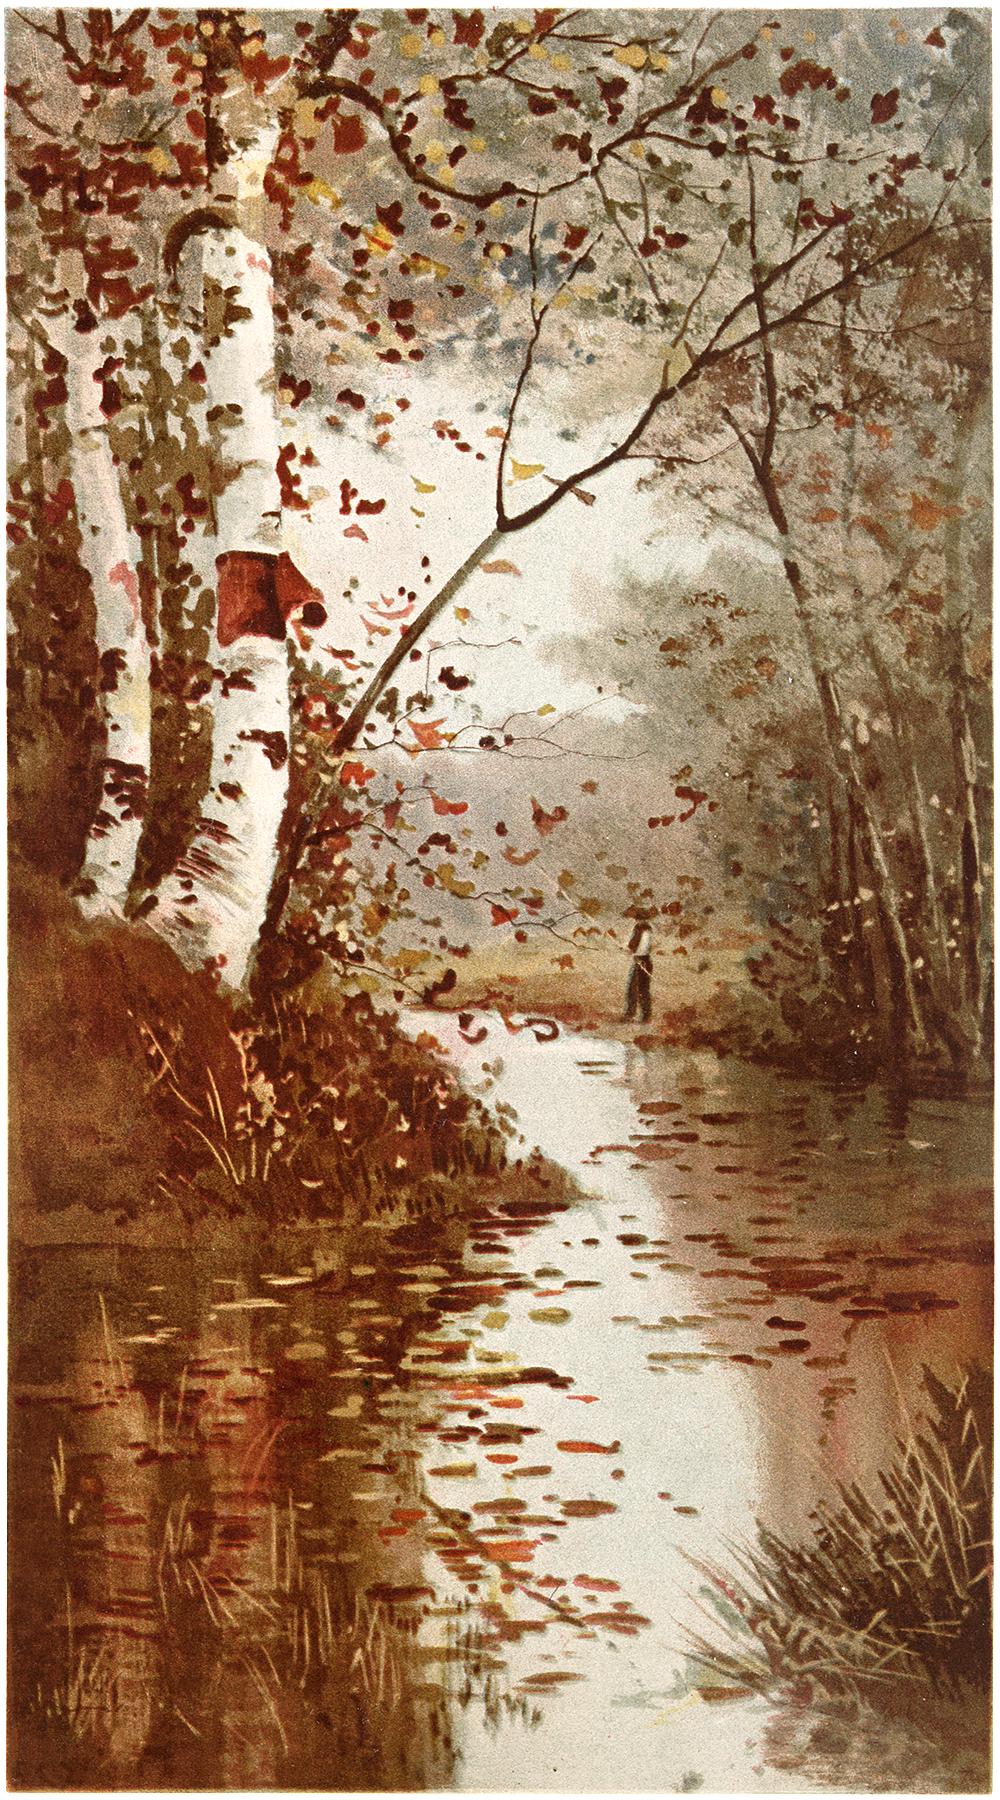 Fall Landscape Scene Image